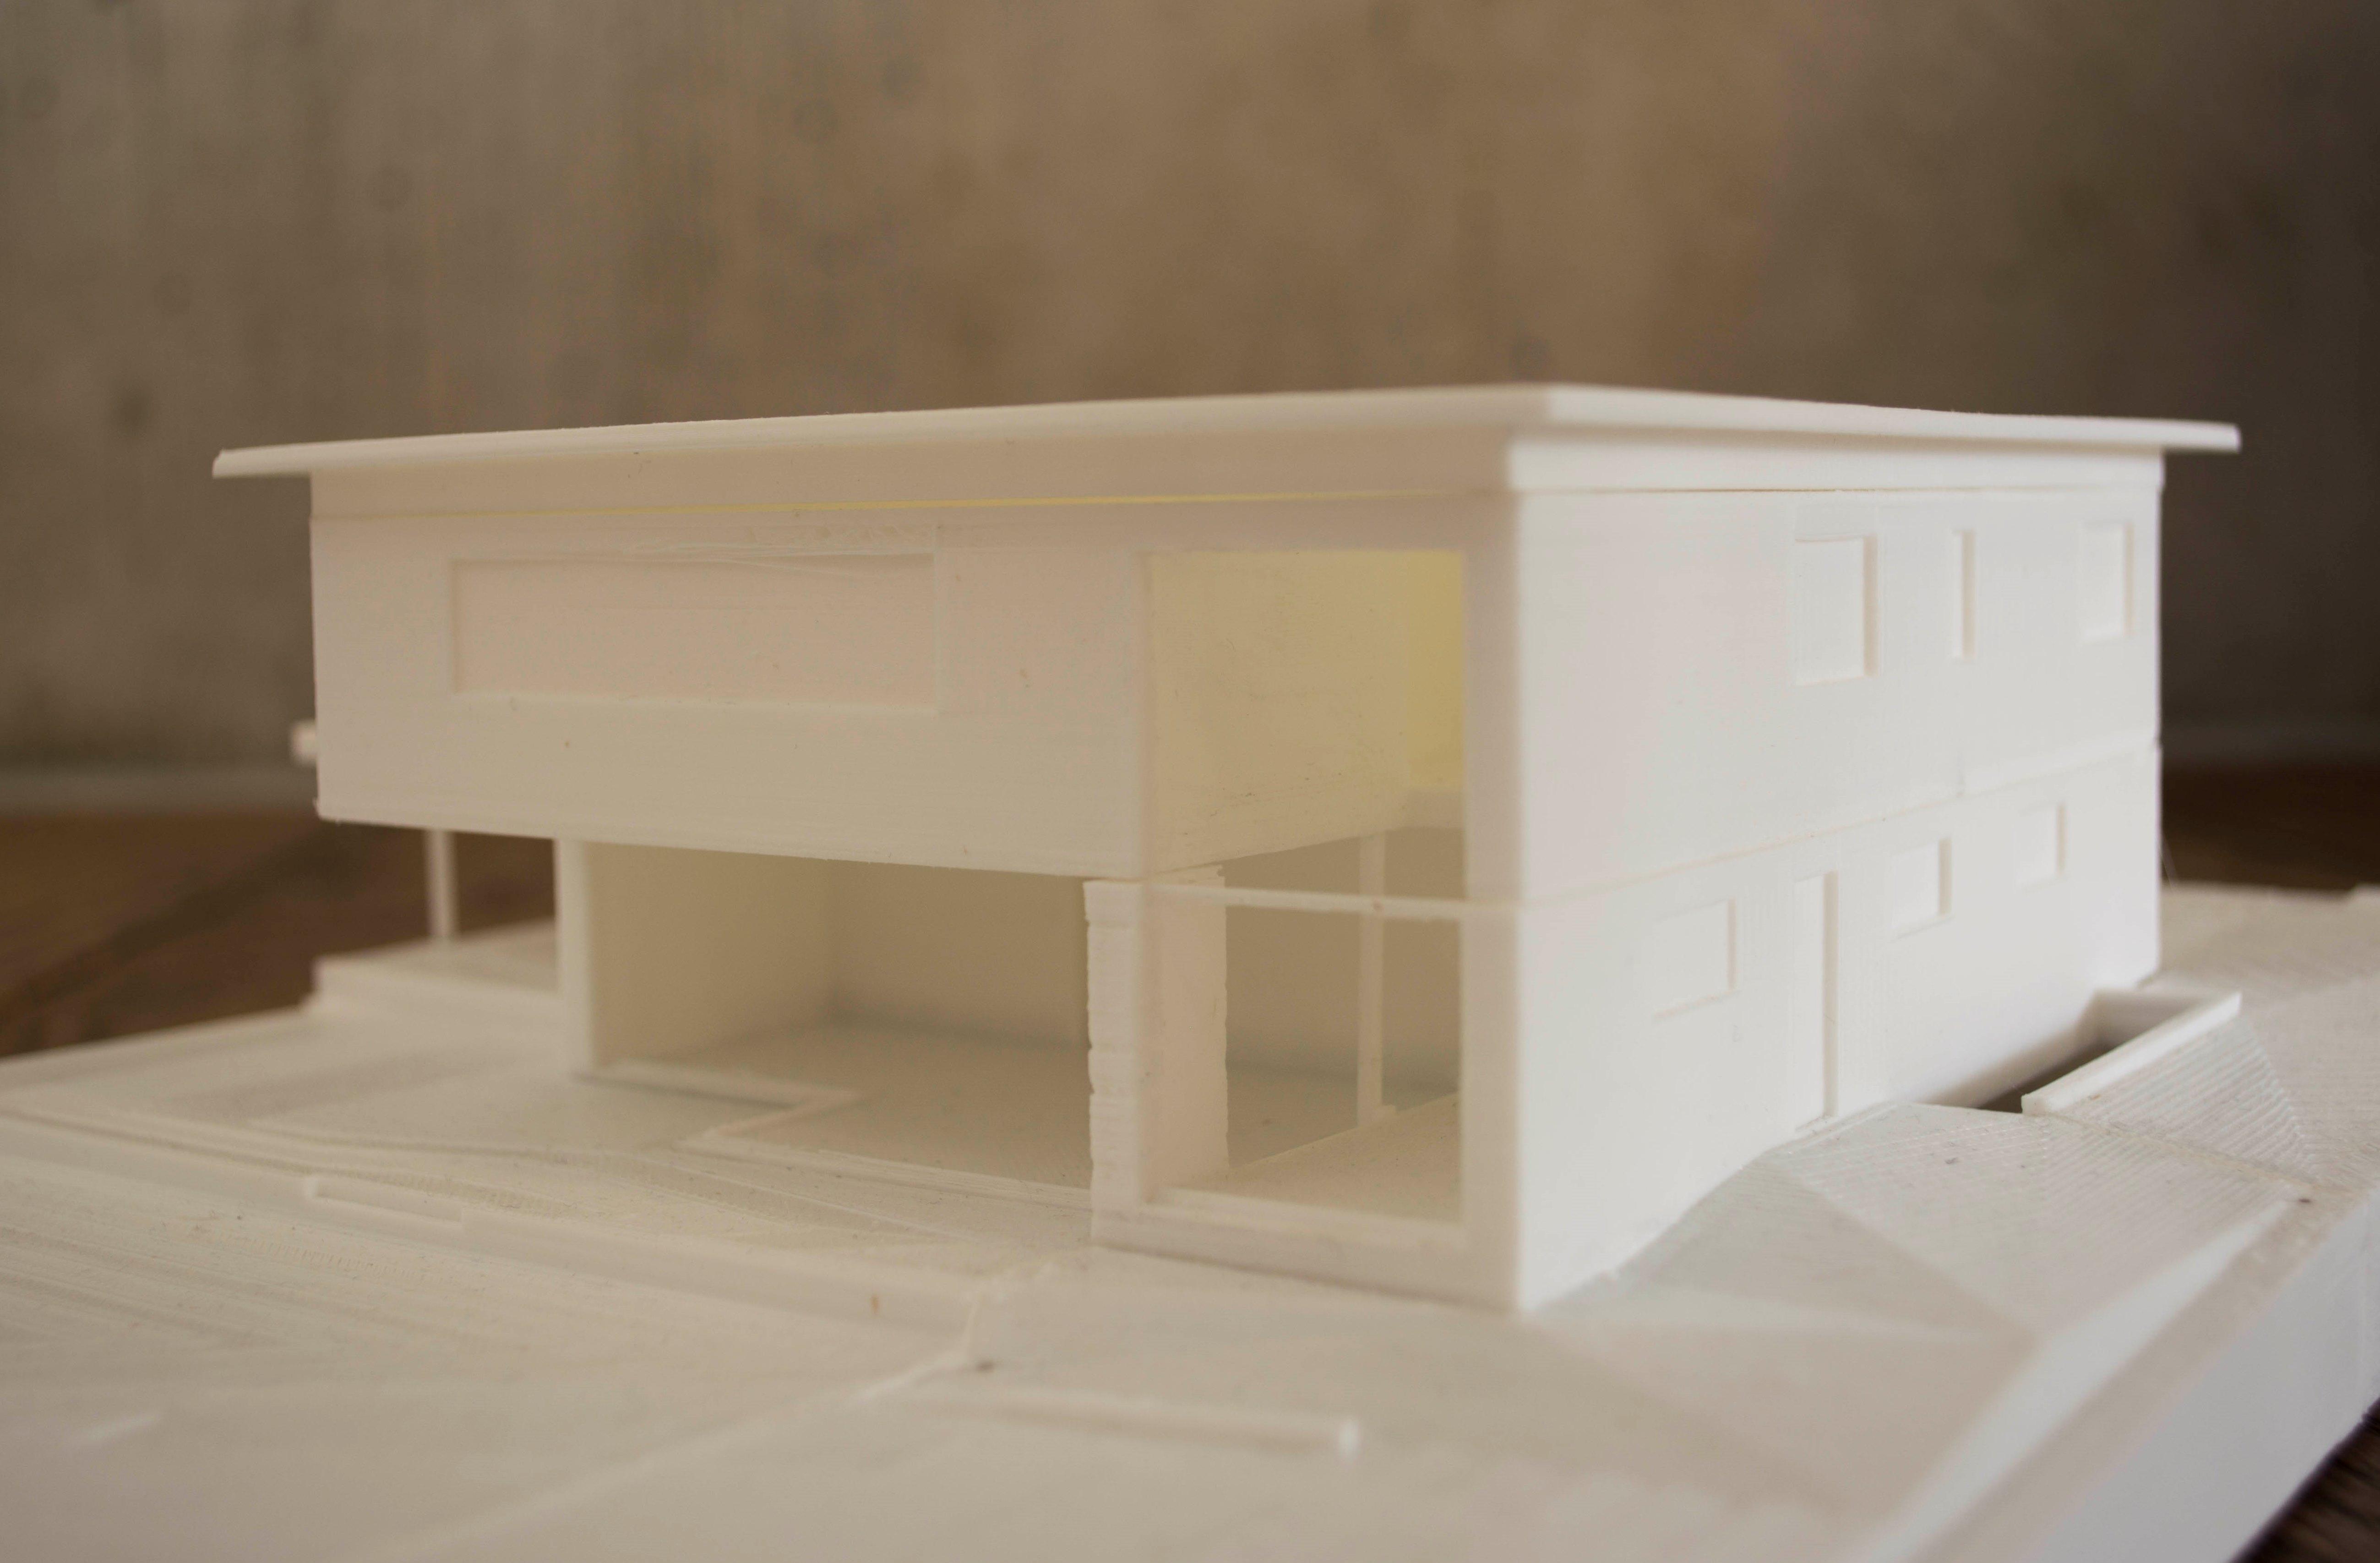 3D Drucker Modell Architektur Moderne modern zeitgenössisch Kaltbrunn Ronner Bauleitung Planung